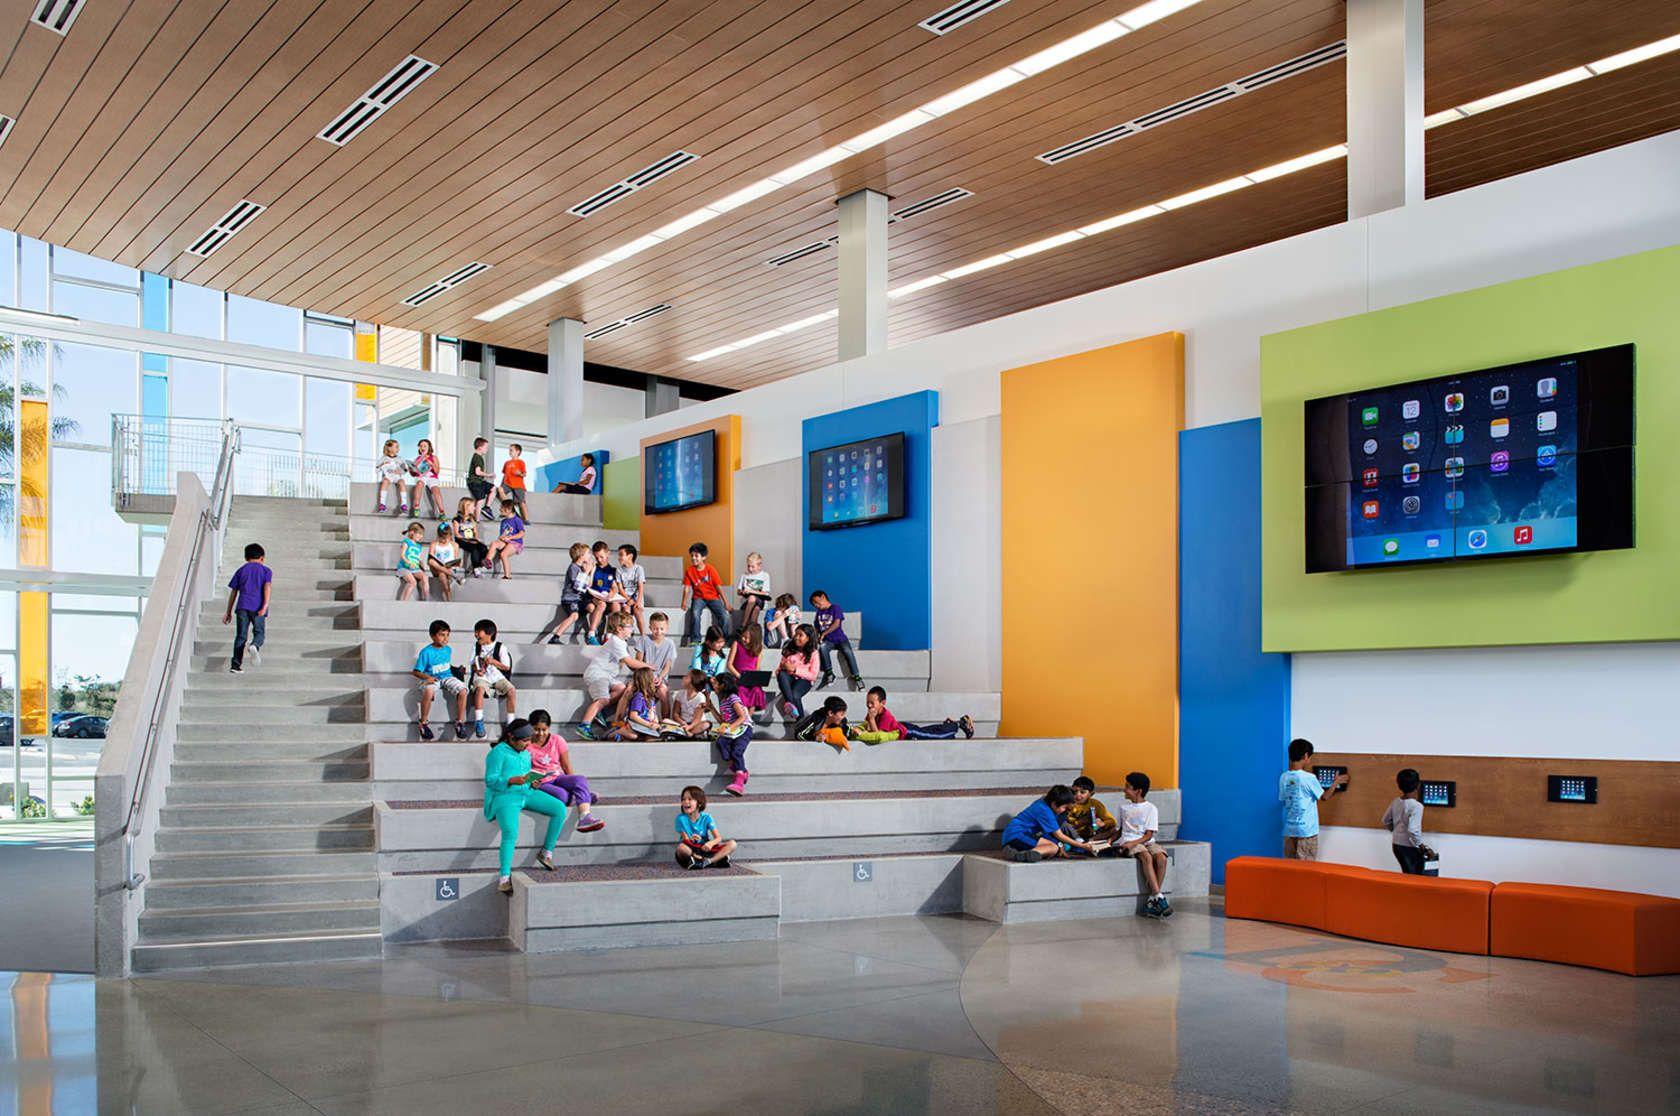 School In San Diego Design 39 Campus School Pinterest San Diego Schools In And Design